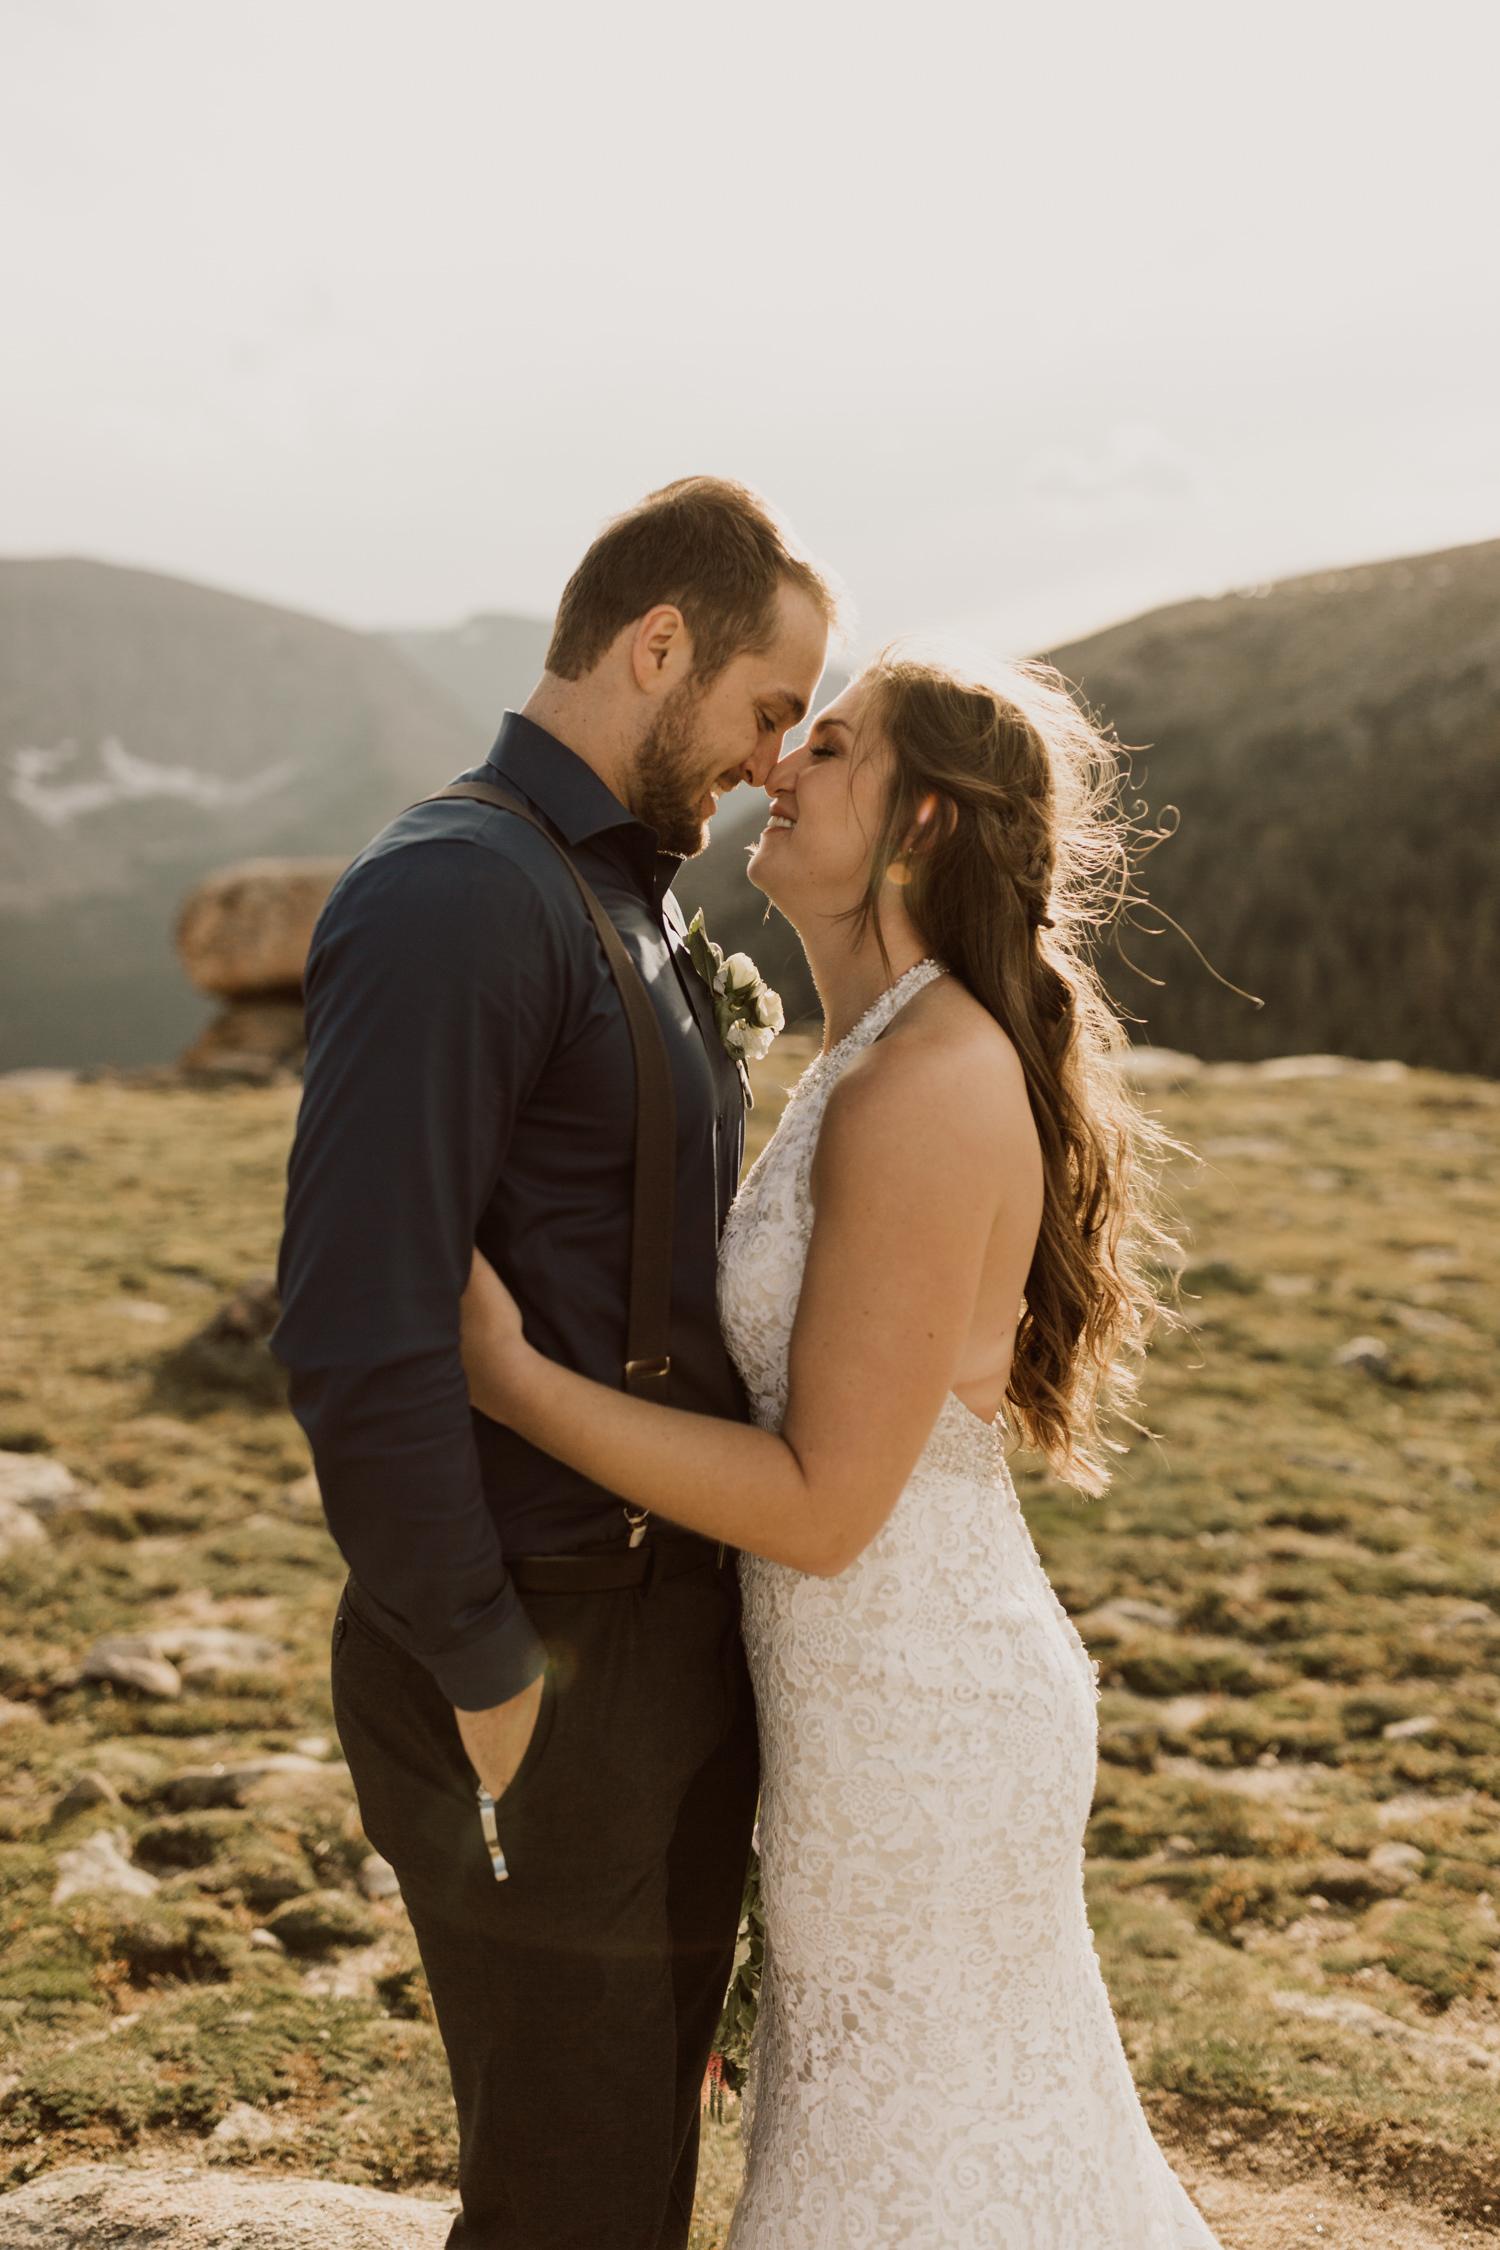 rocky-mountain-national-park-wedding-44.jpg